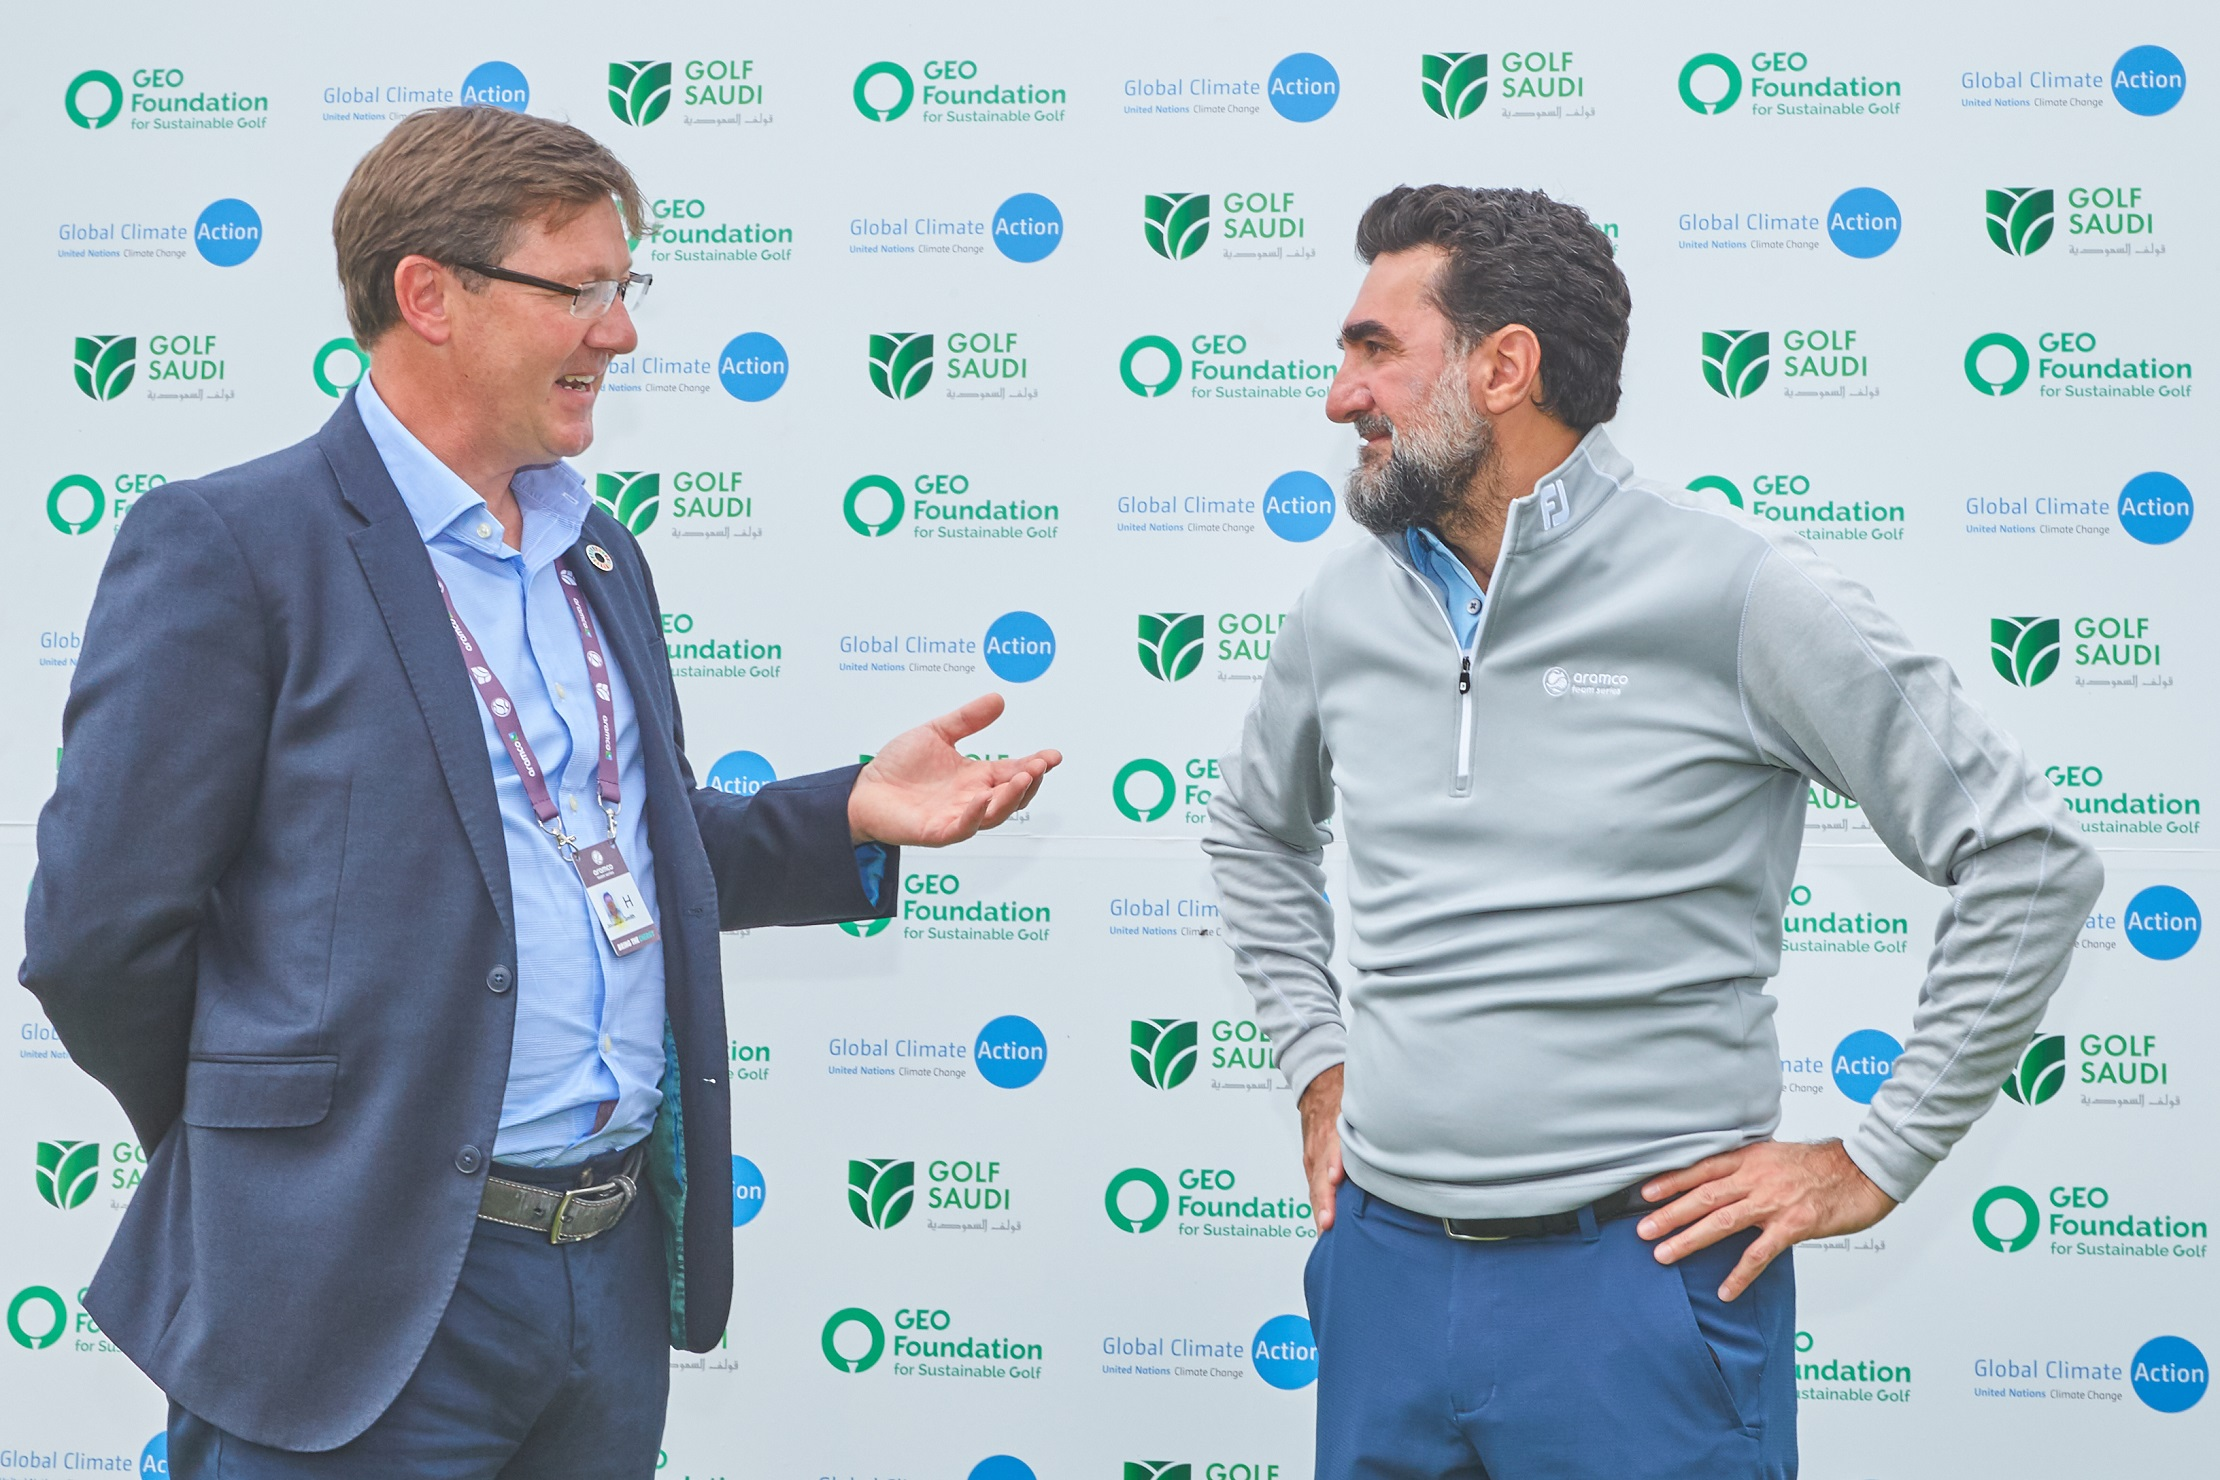 (L-R) Jonathan Smith, Executive Director and Founder, GEO Foundation and His Excellency, Yasir Al-Rumayyan, Chairman, Golf Saudi